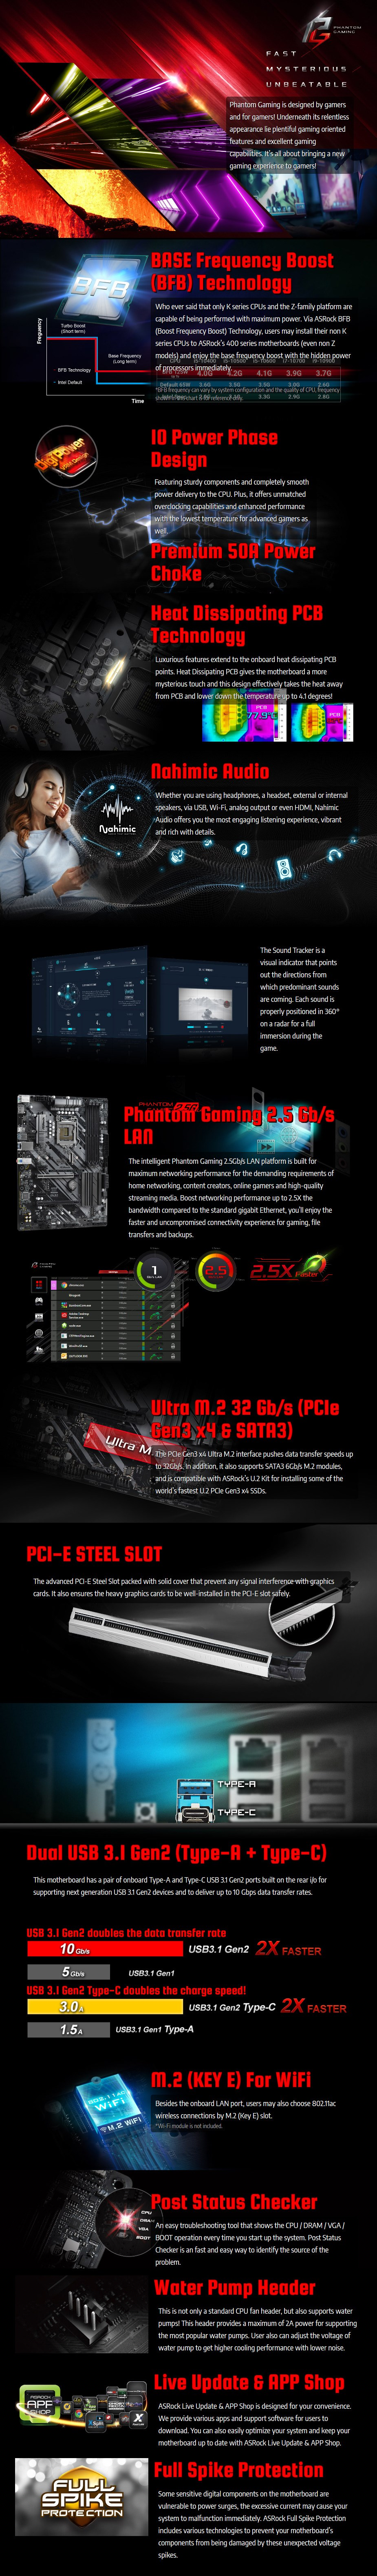 asrock-z490-phantom-gaming-425g-lga-1200-atx-motherboard-ac34589-9.jpg